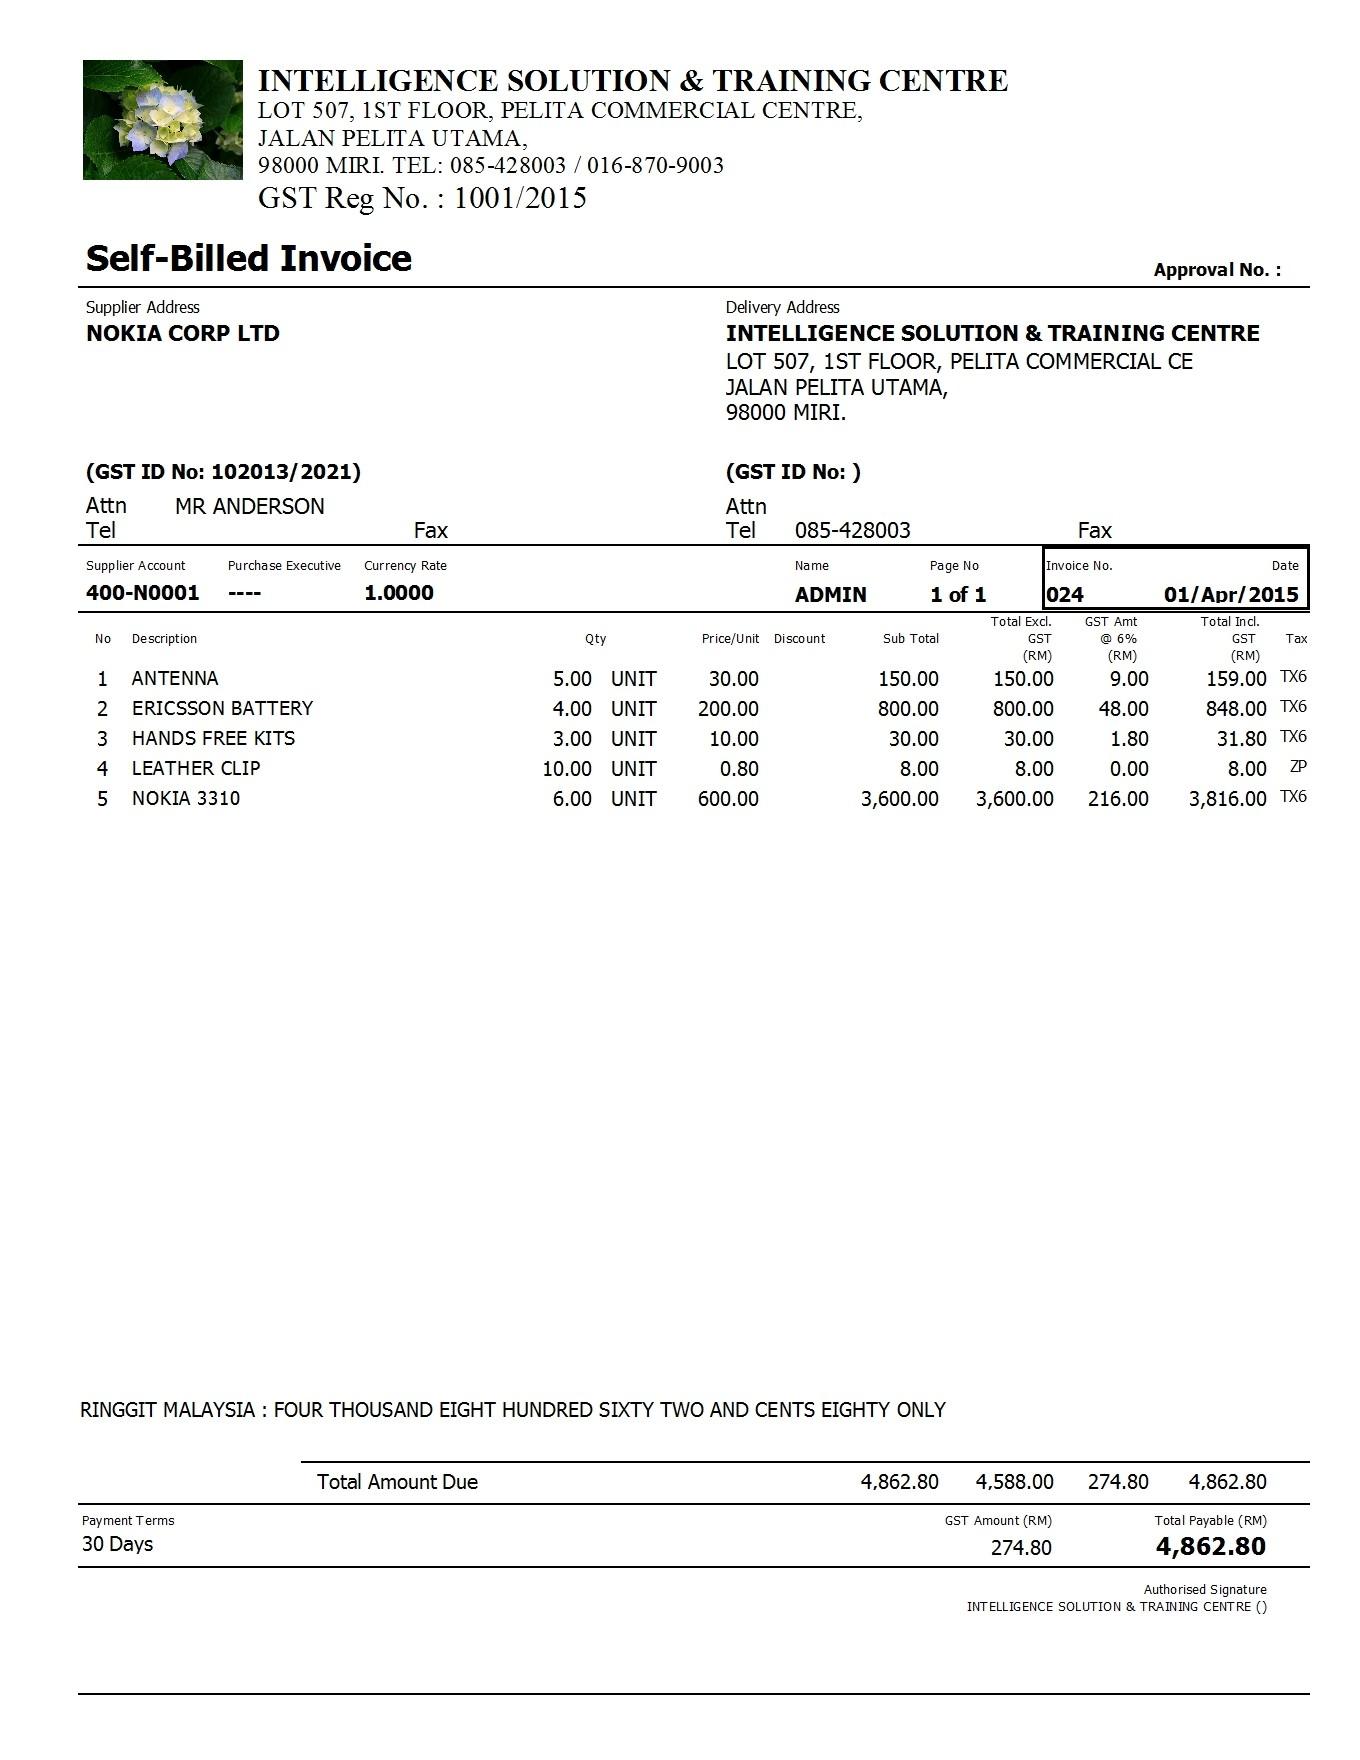 gst istc self bill invoice